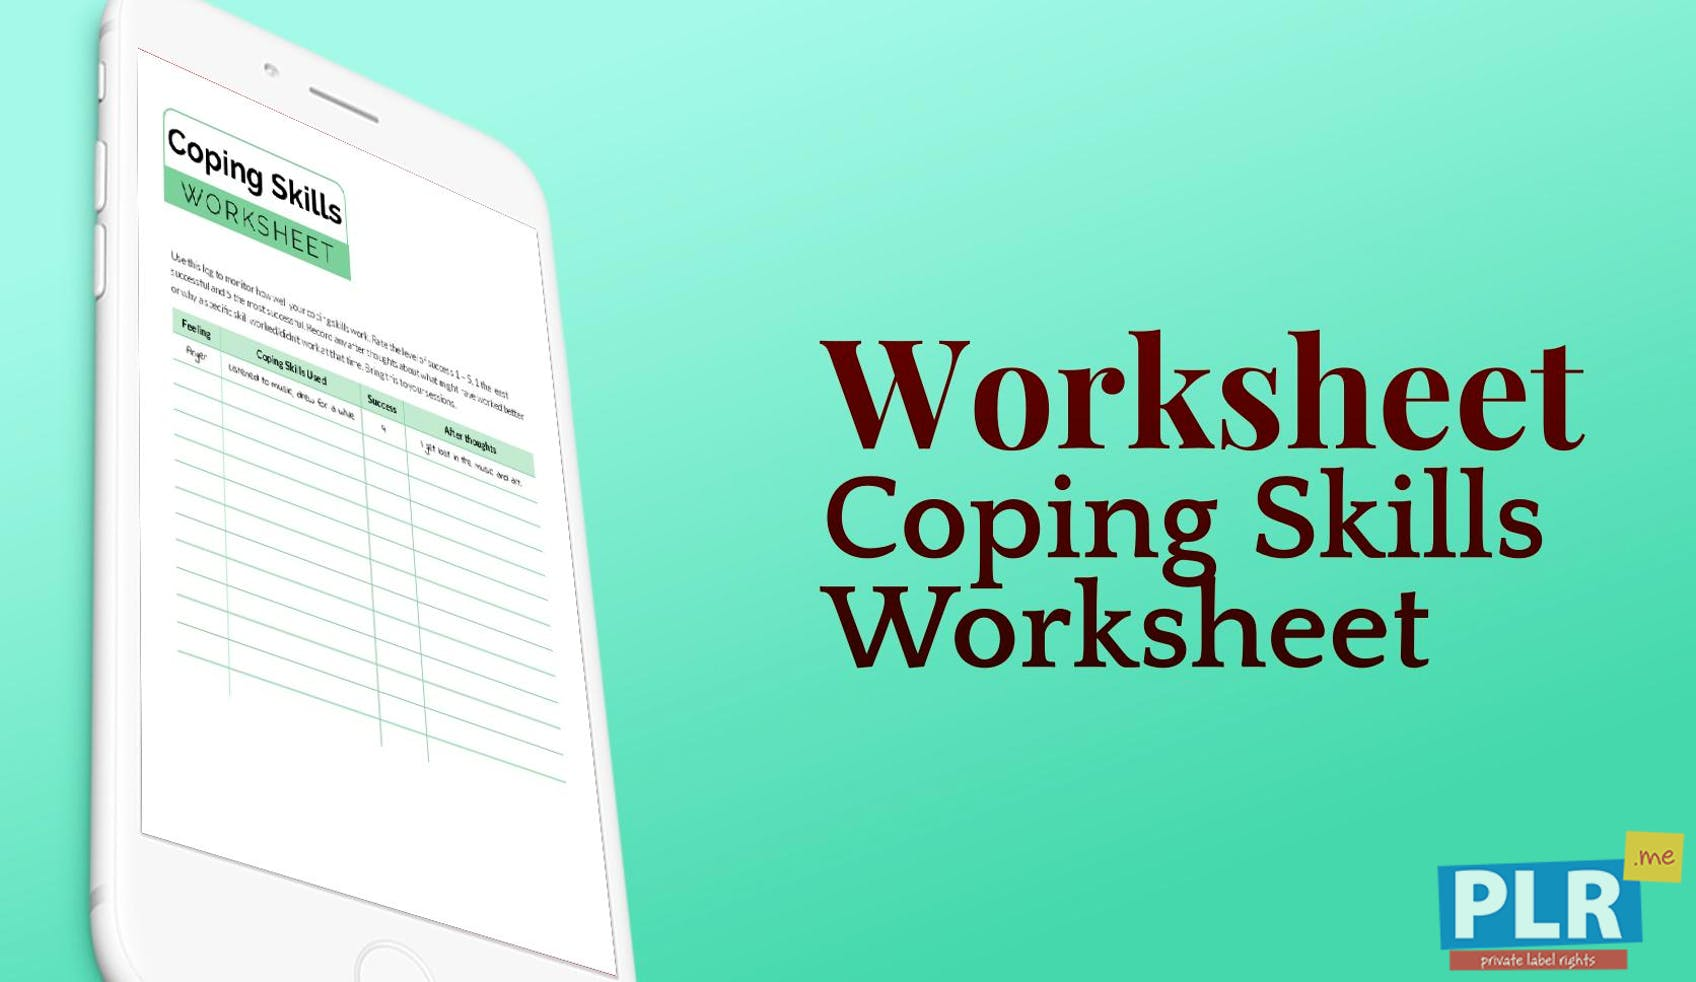 PLR Worksheets - Coping Skills Worksheet - PLR.me